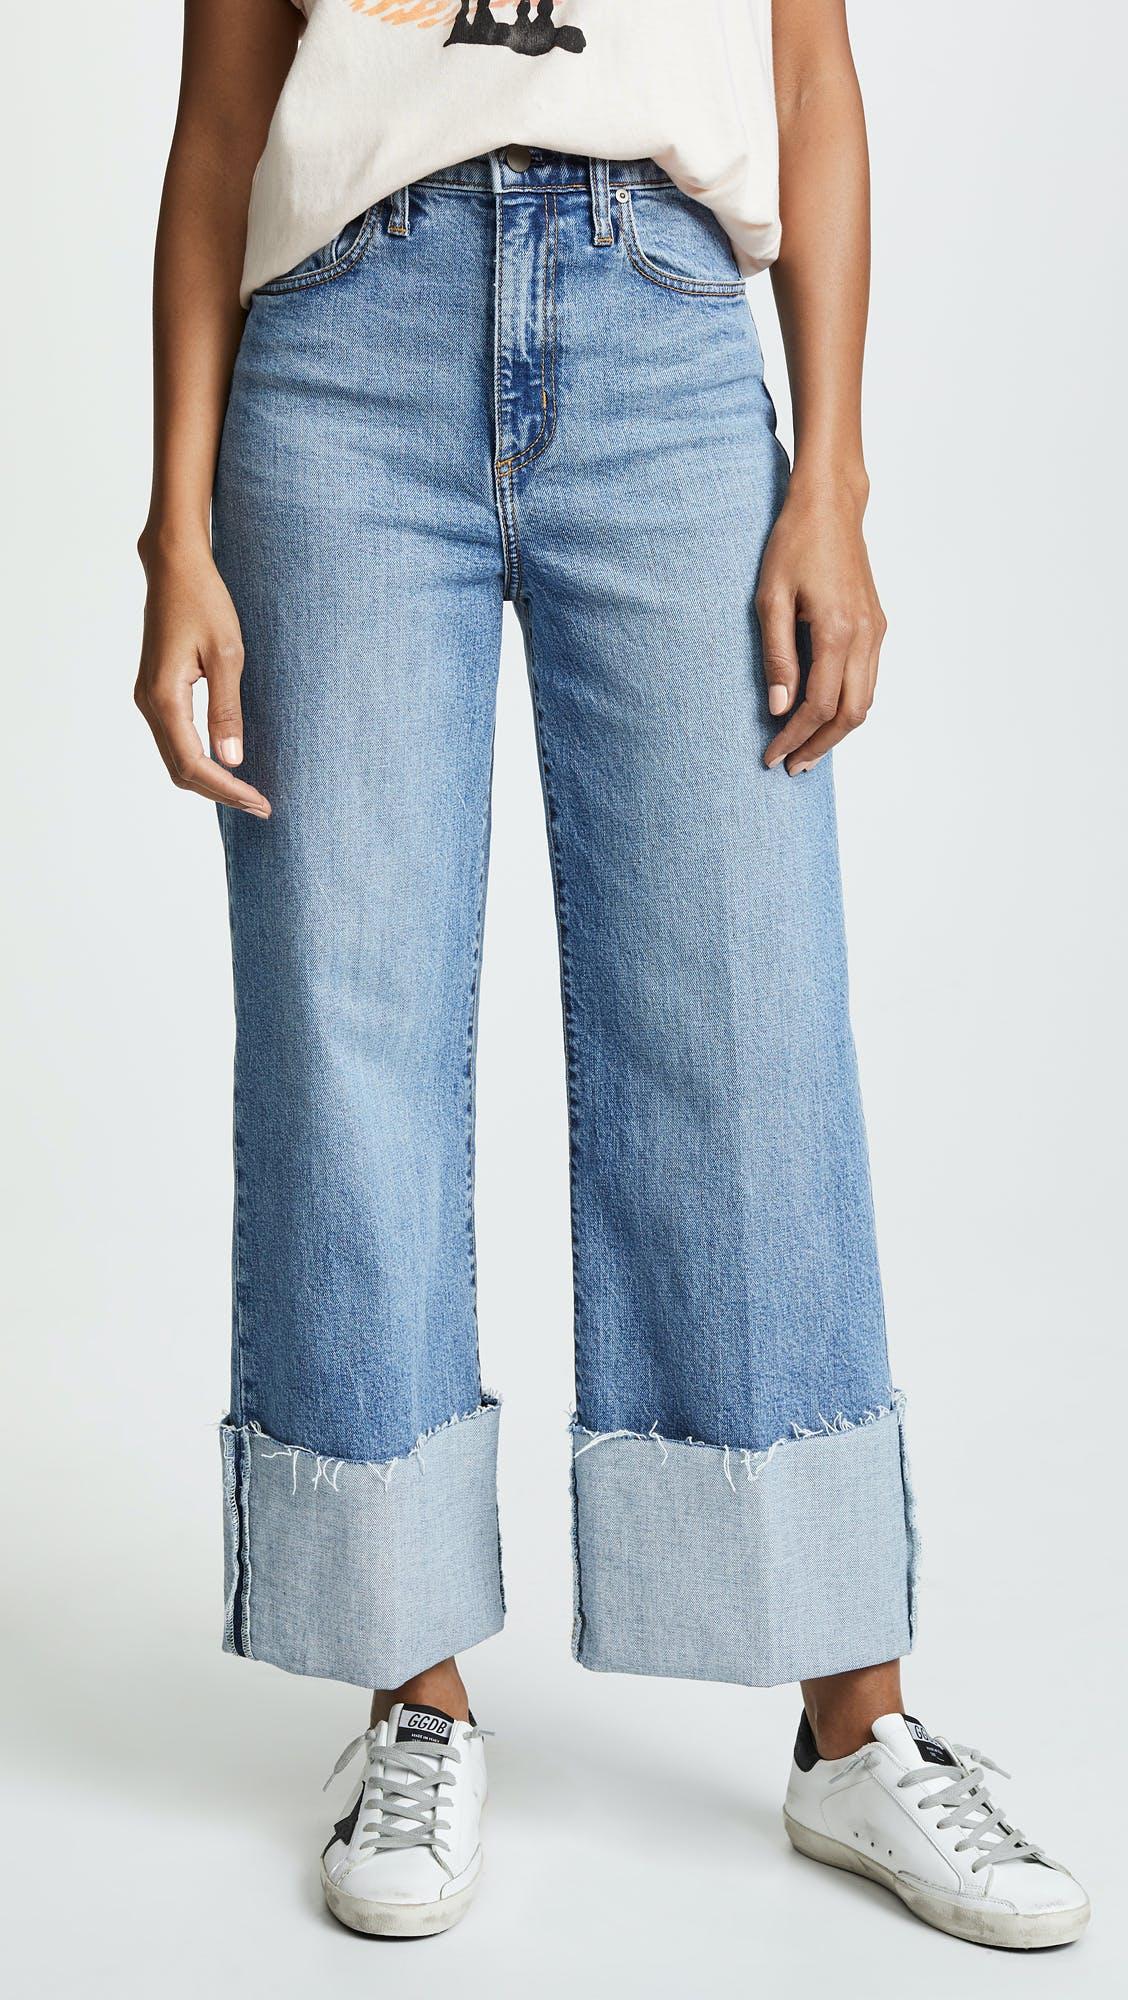 Milla Cuffed Jeans